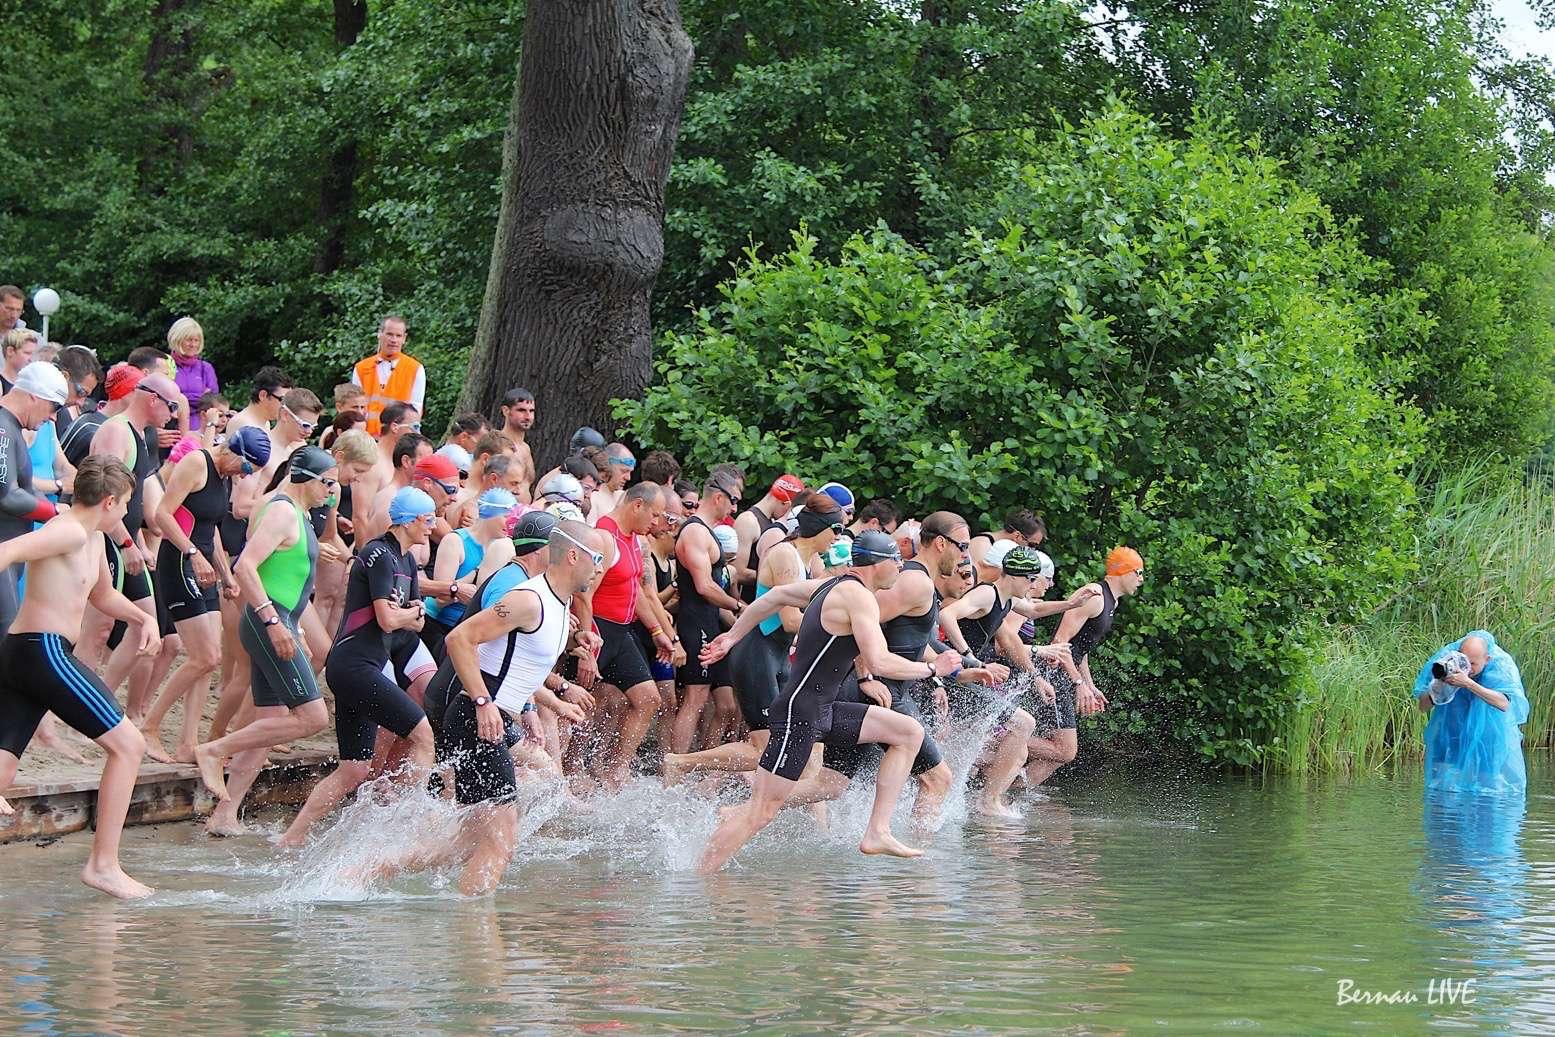 Optegra-Liepnitzsee-Triathlon am Liepnitzsee gestartet